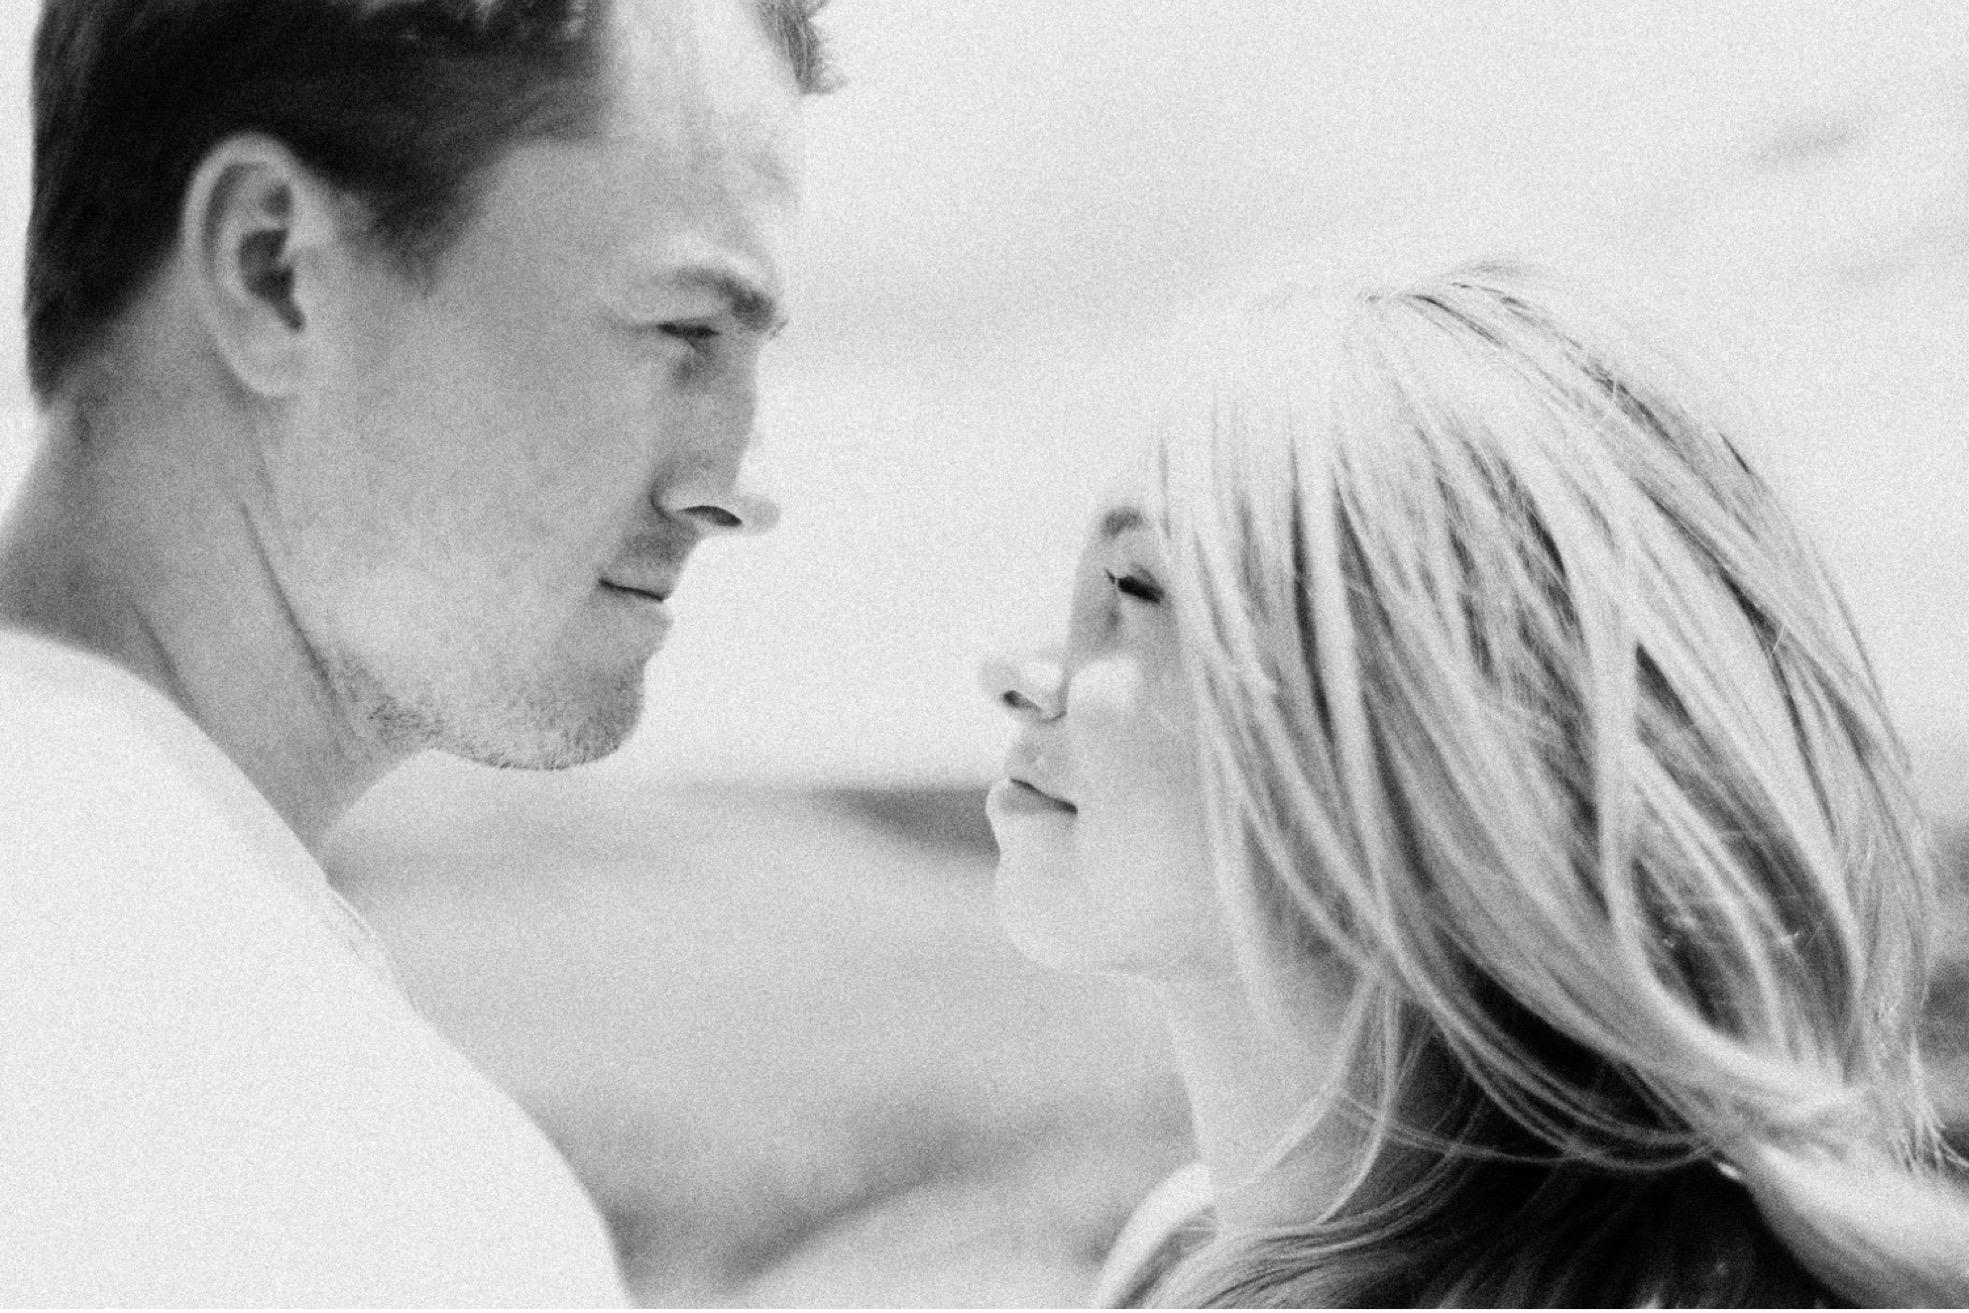 71_Marfa-Texas-Engagement-Jessica-Sherrell-371.jpg